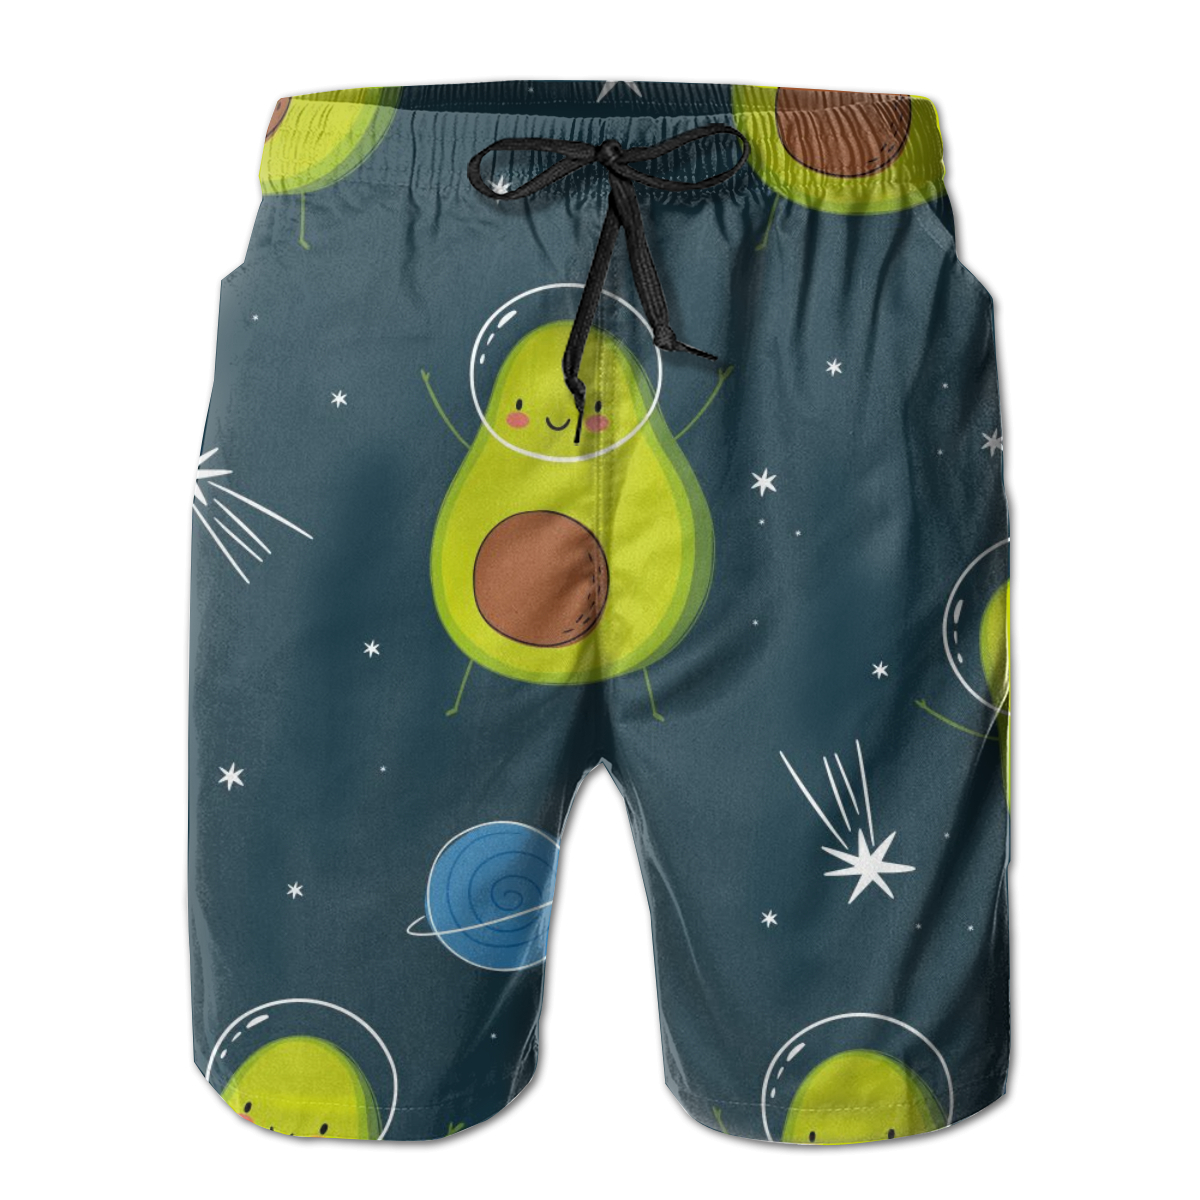 Mens Swimwear Swim Shorts Trunks Avocado Cartoon Beach Board Shorts Swimming Swimsuits Mens Running Sports Surffing shorts